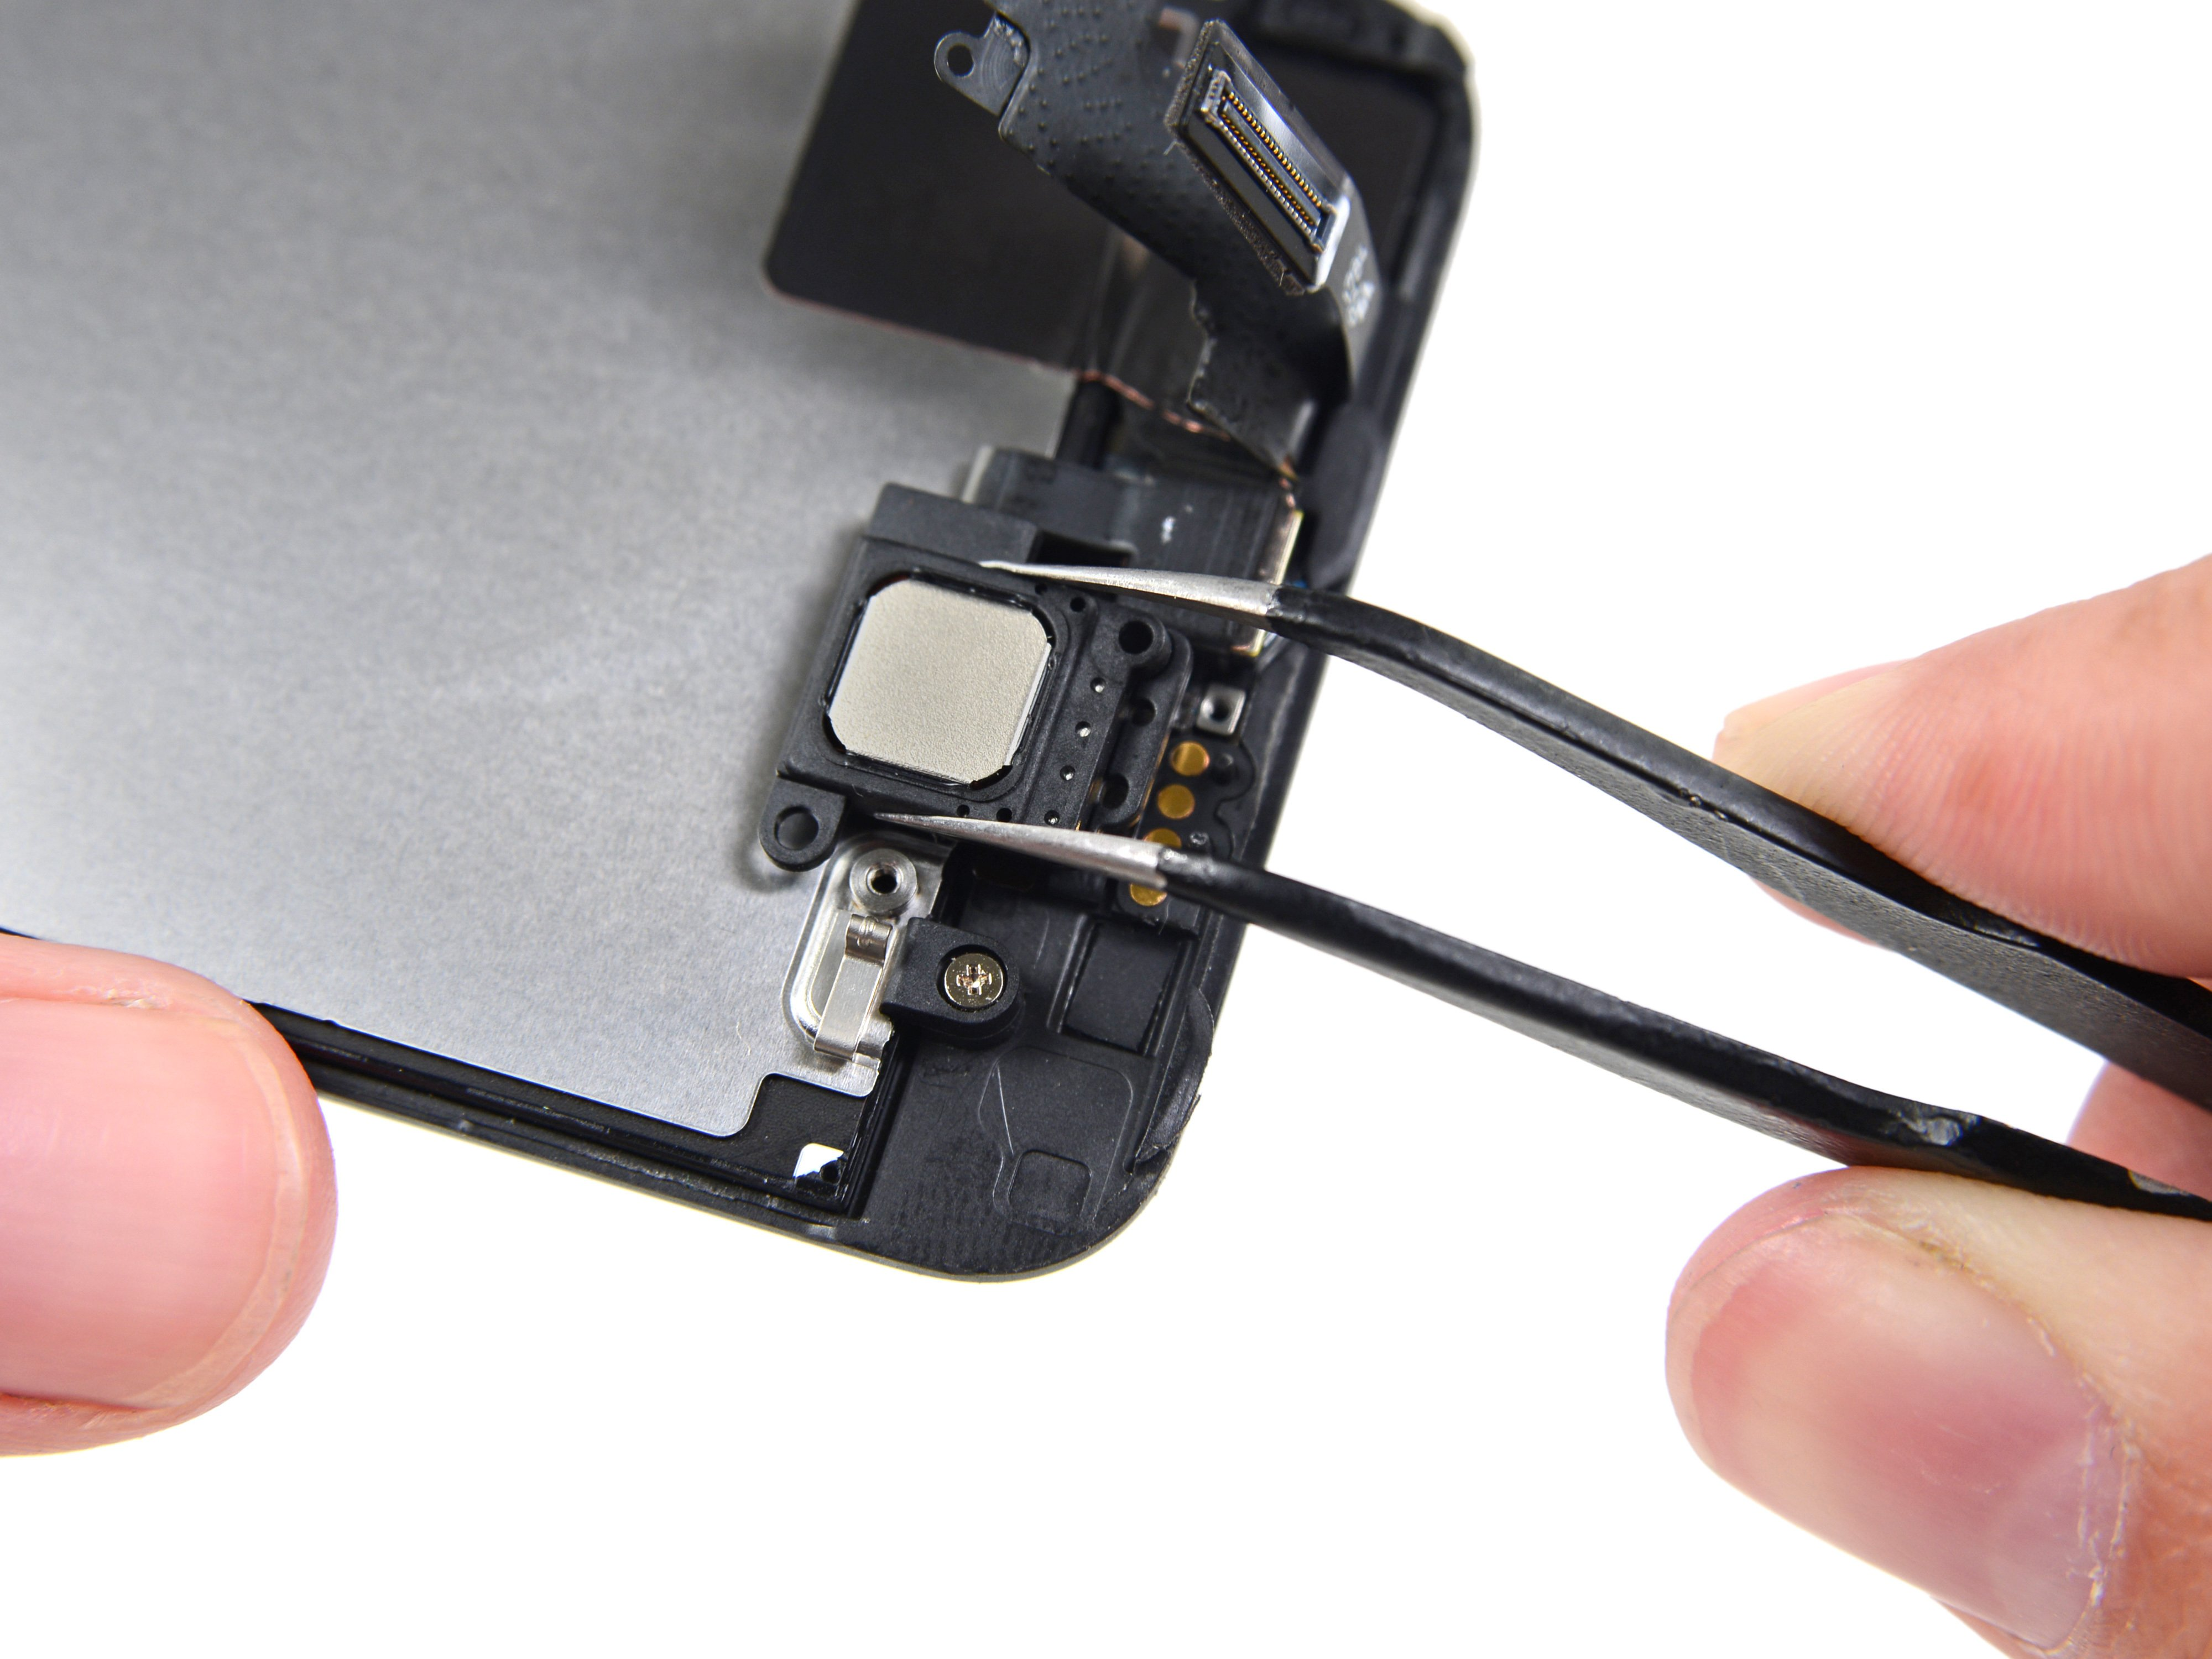 iPhone 9s Earpiece Speaker Replacement - iFixit Repair Guide